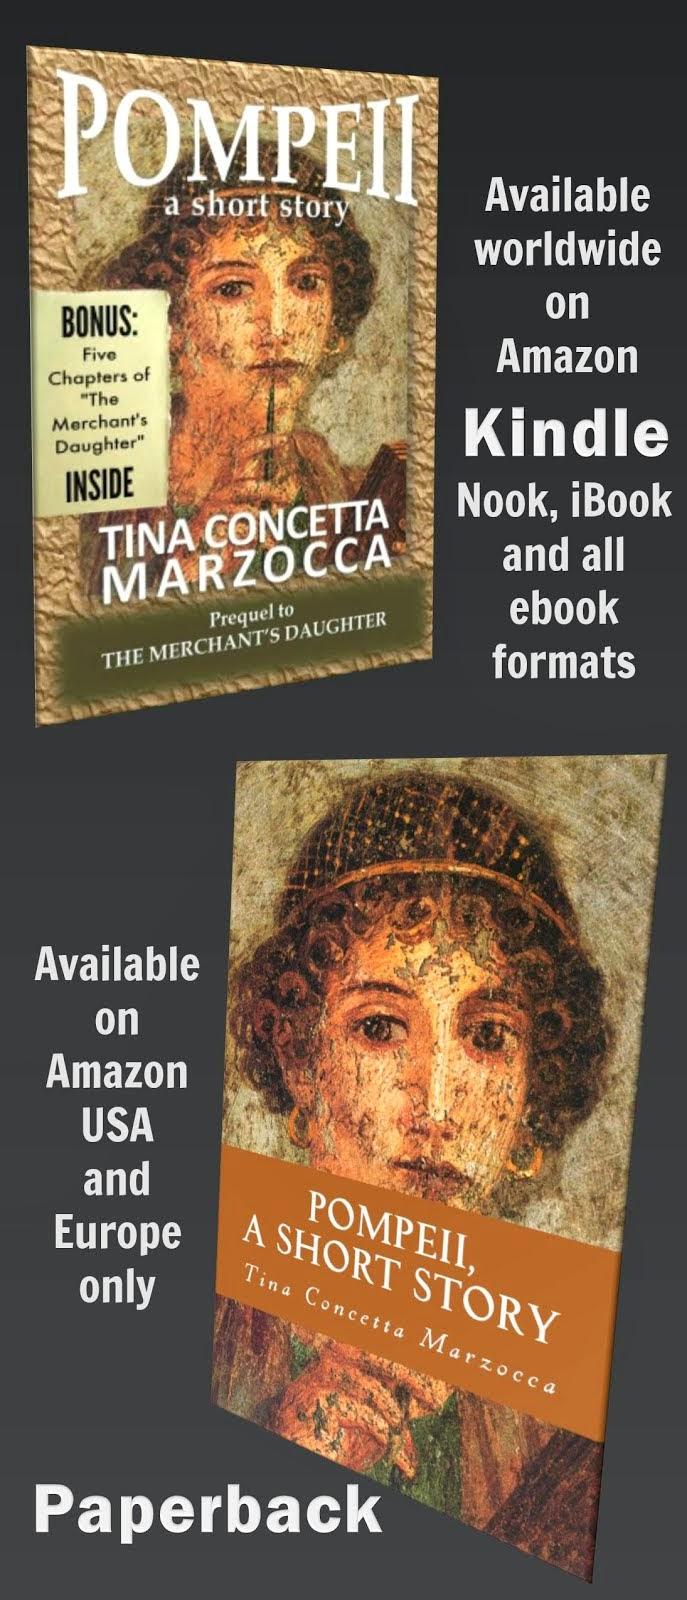 Pompeii, a Short Story